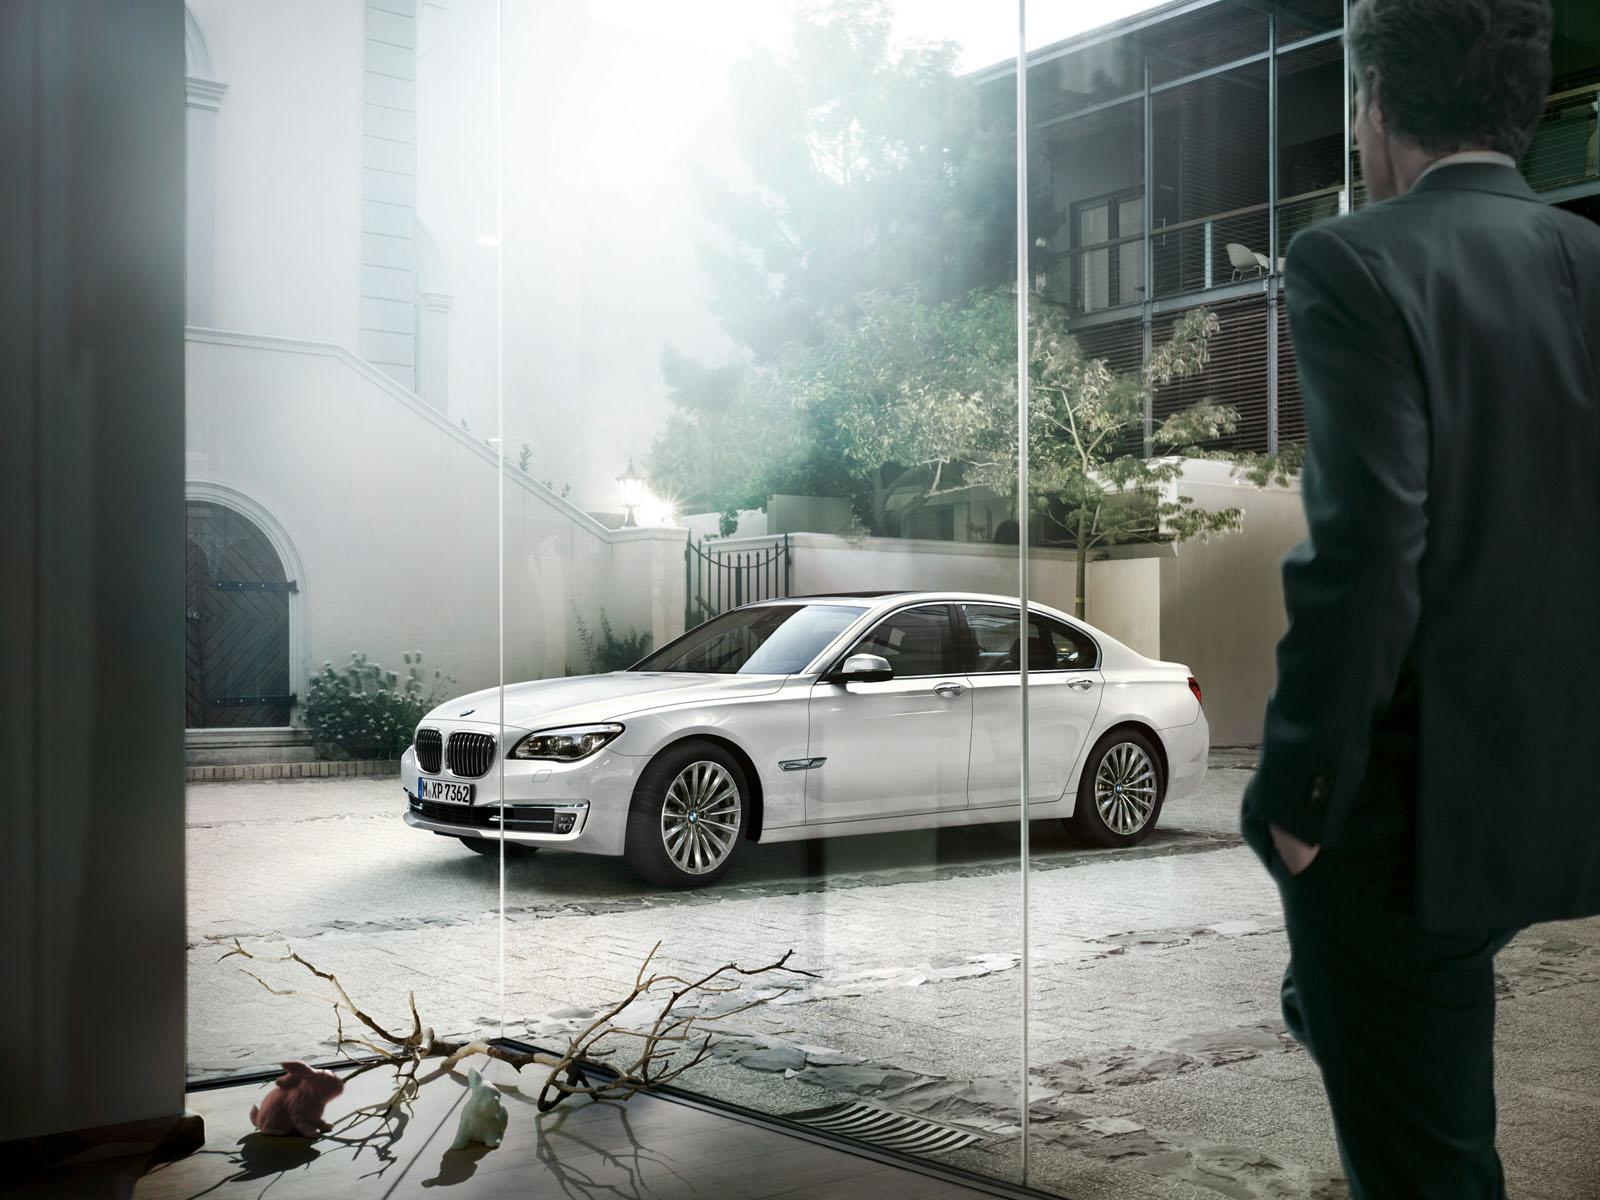 http://1.bp.blogspot.com/-c3Xkgh7T5H8/T9y3jybfZvI/AAAAAAAAA9E/6i3IZVSlZSI/s1600/BMW-7-Series-Wallpaper-13-1600x1200.jpg